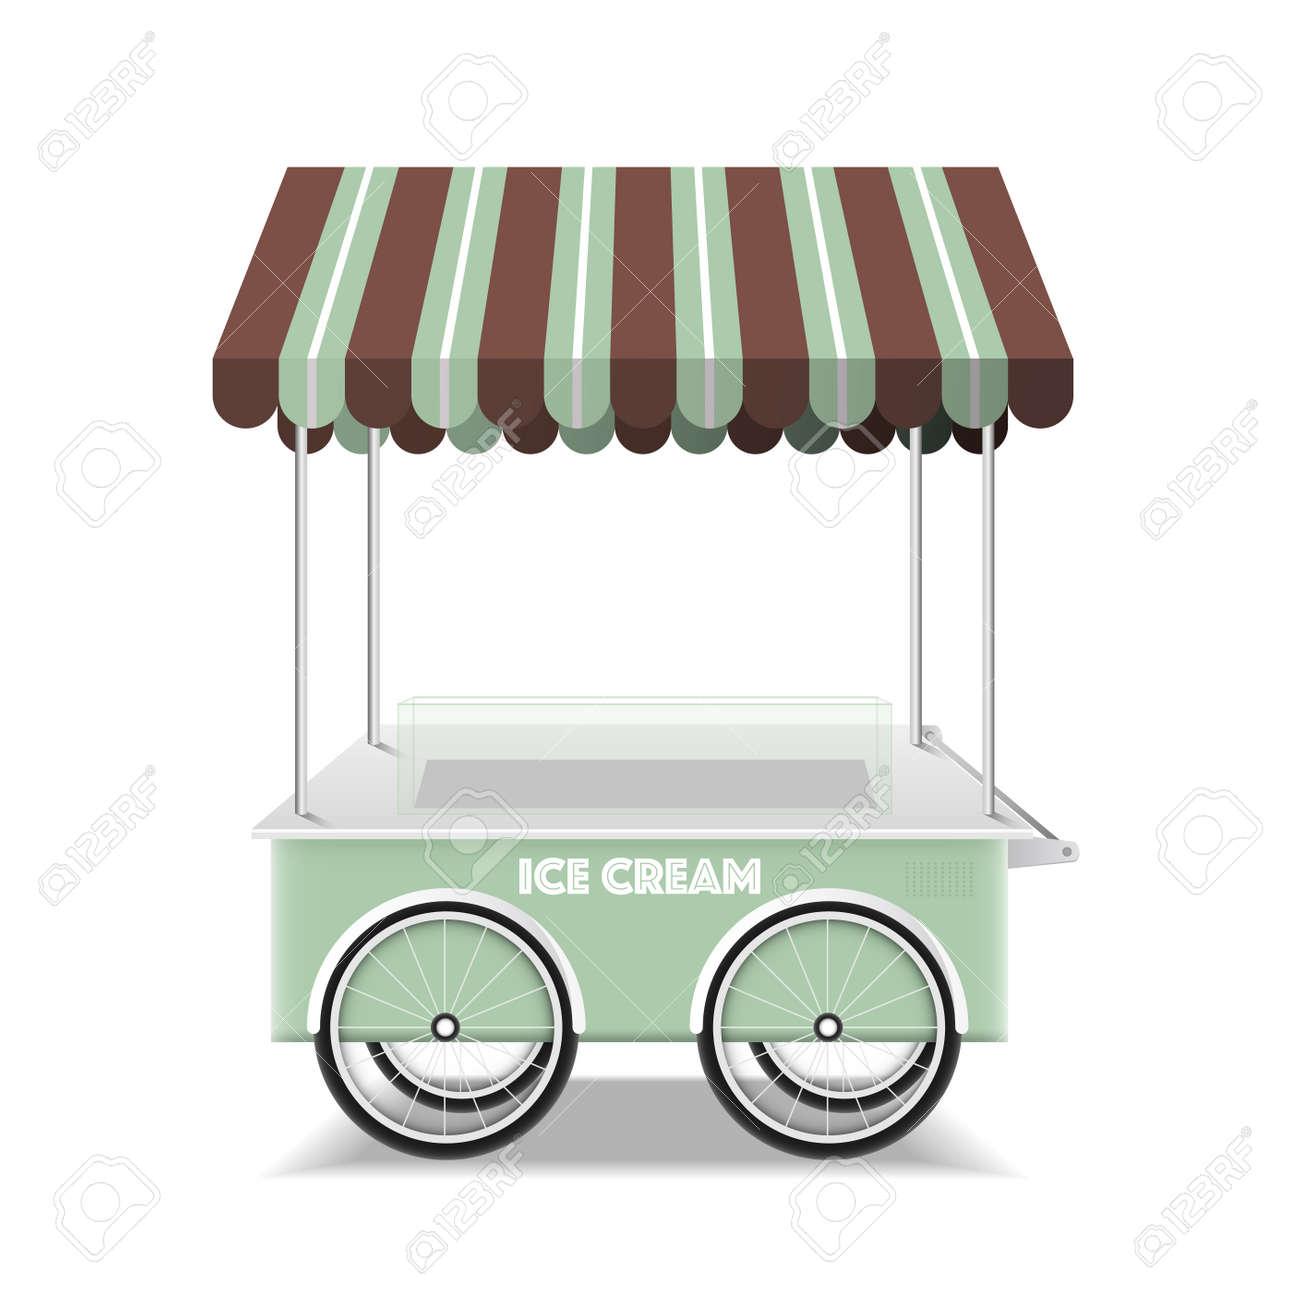 Ice cream cart on white background vector design. - 159142933